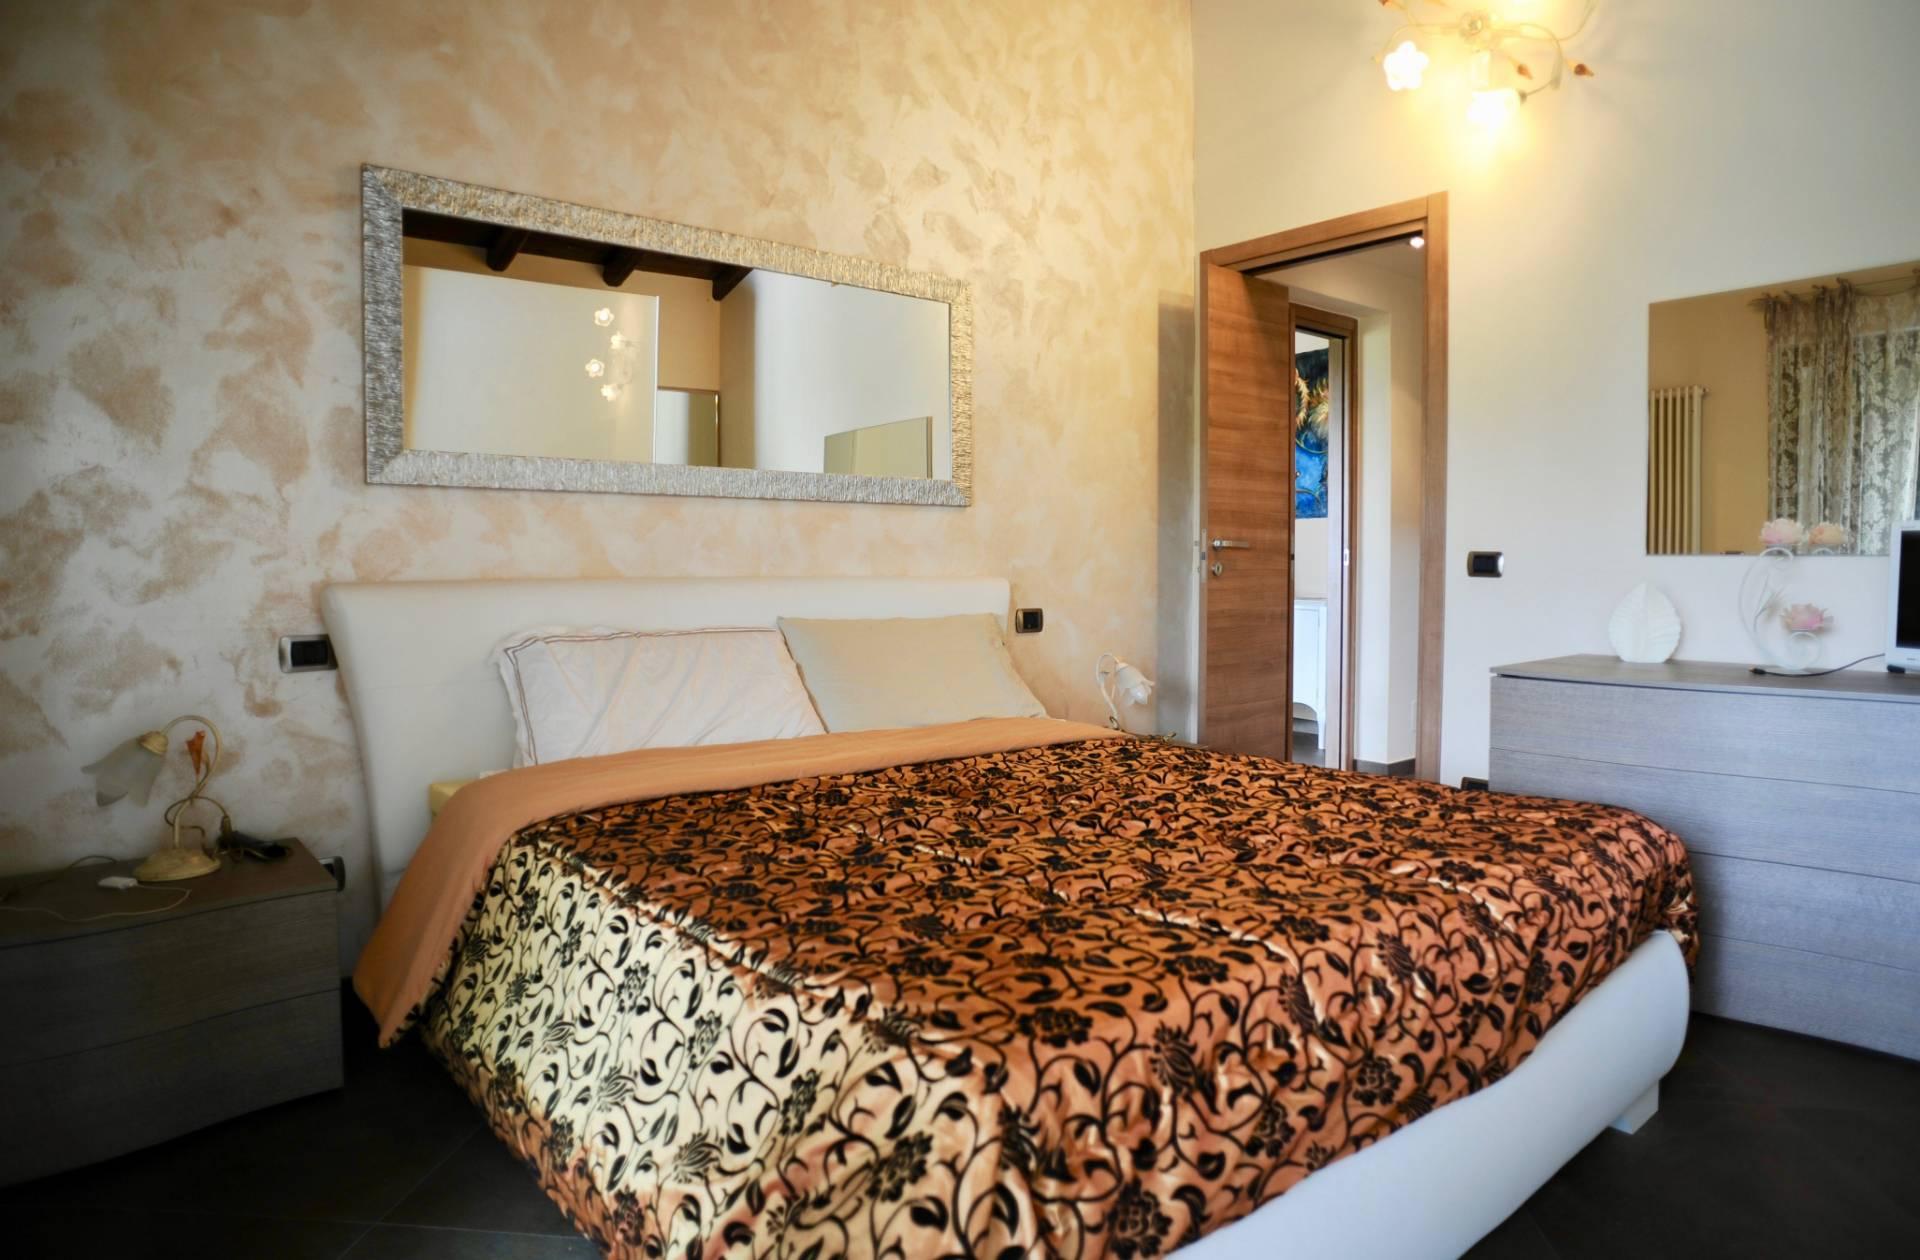 Villa in Vendita a Padenghe Sul Garda: 3 locali, 100 mq - Foto 6